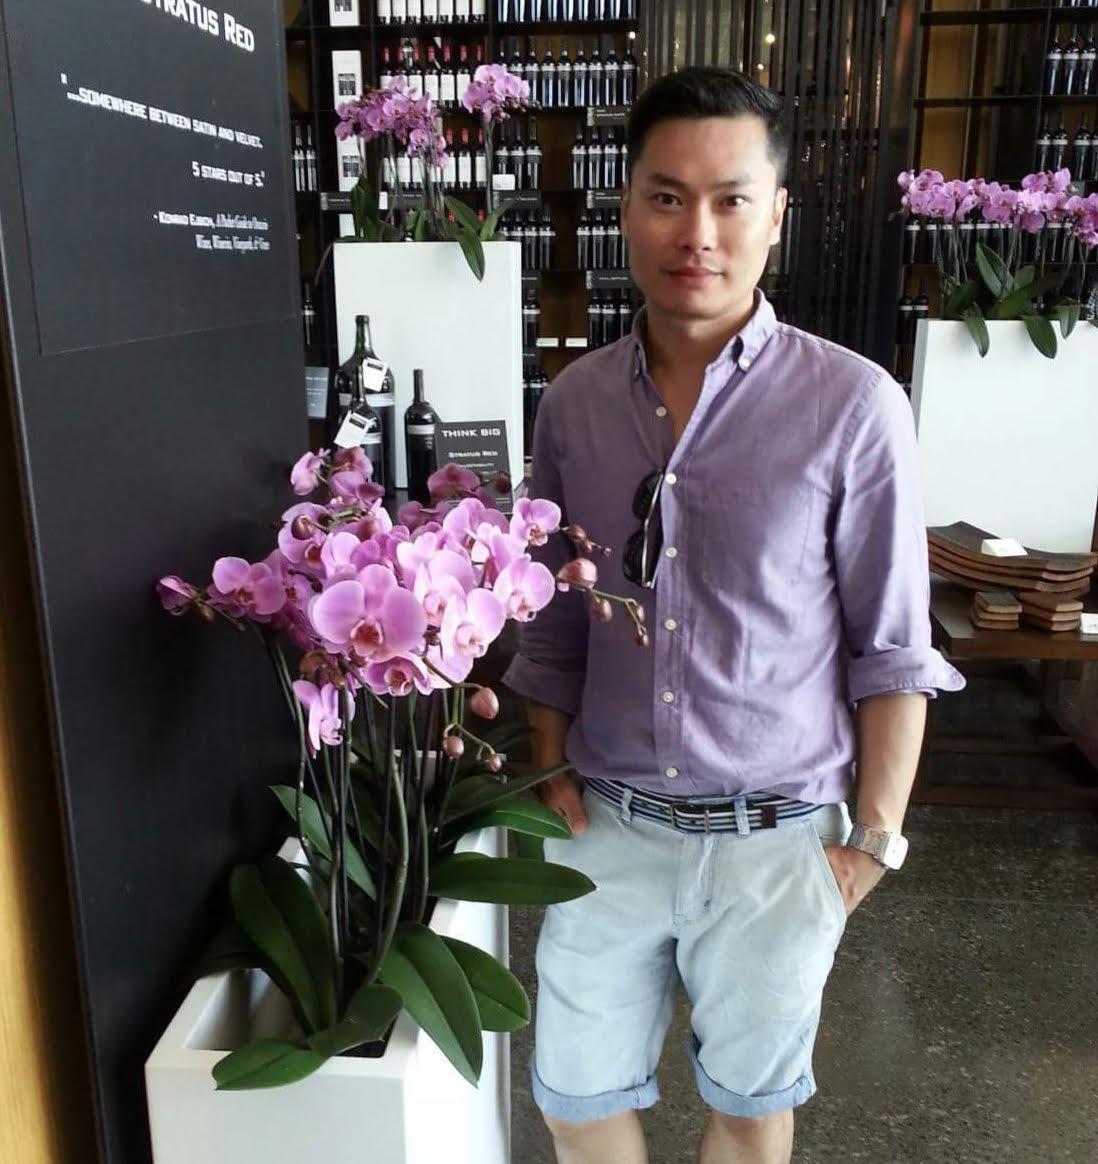 Keith Chau